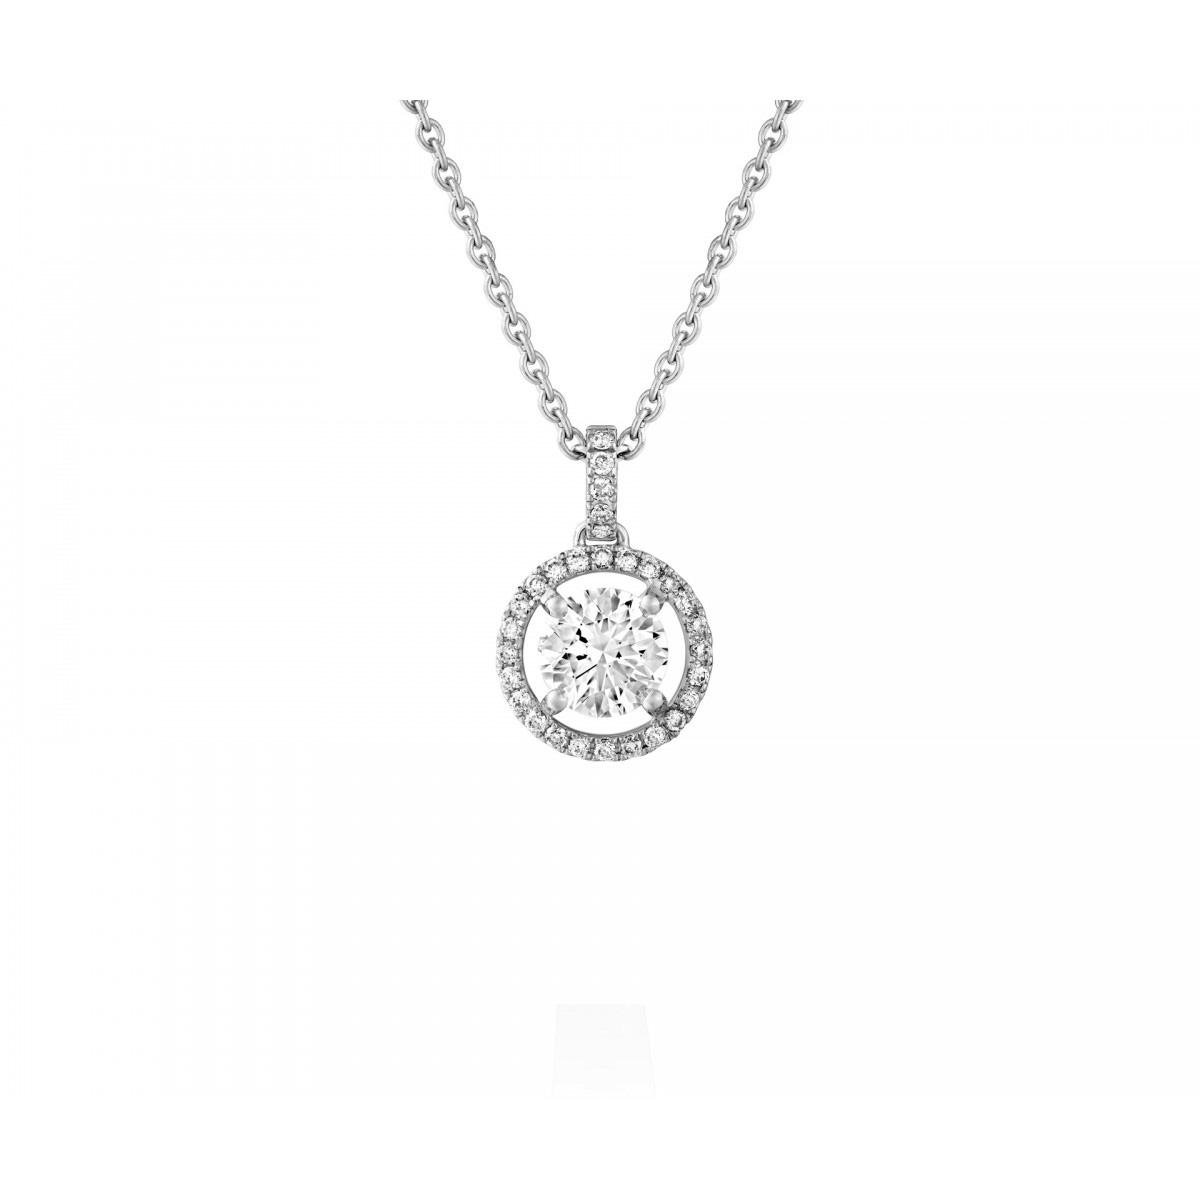 17350a914 De Beers Wedding Jewellery - ROCK MY WEDDING | UK WEDDING BLOG ...